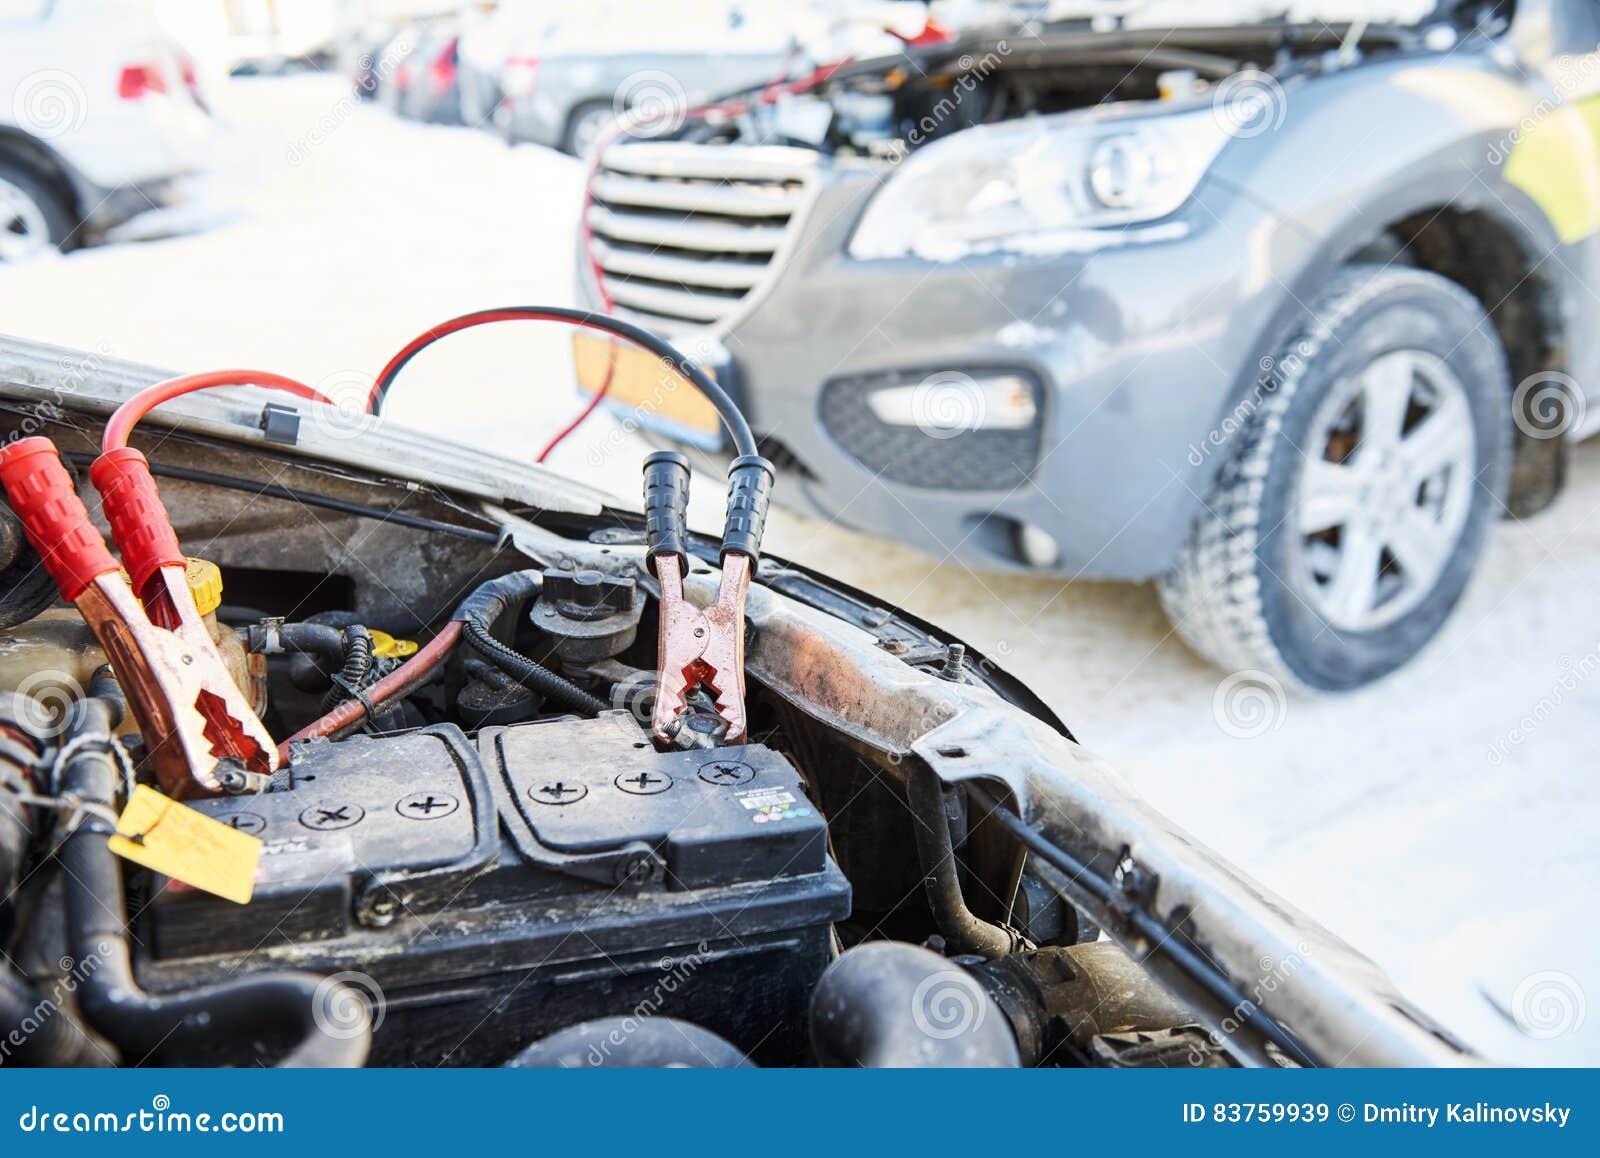 Car Battery Winter Problems